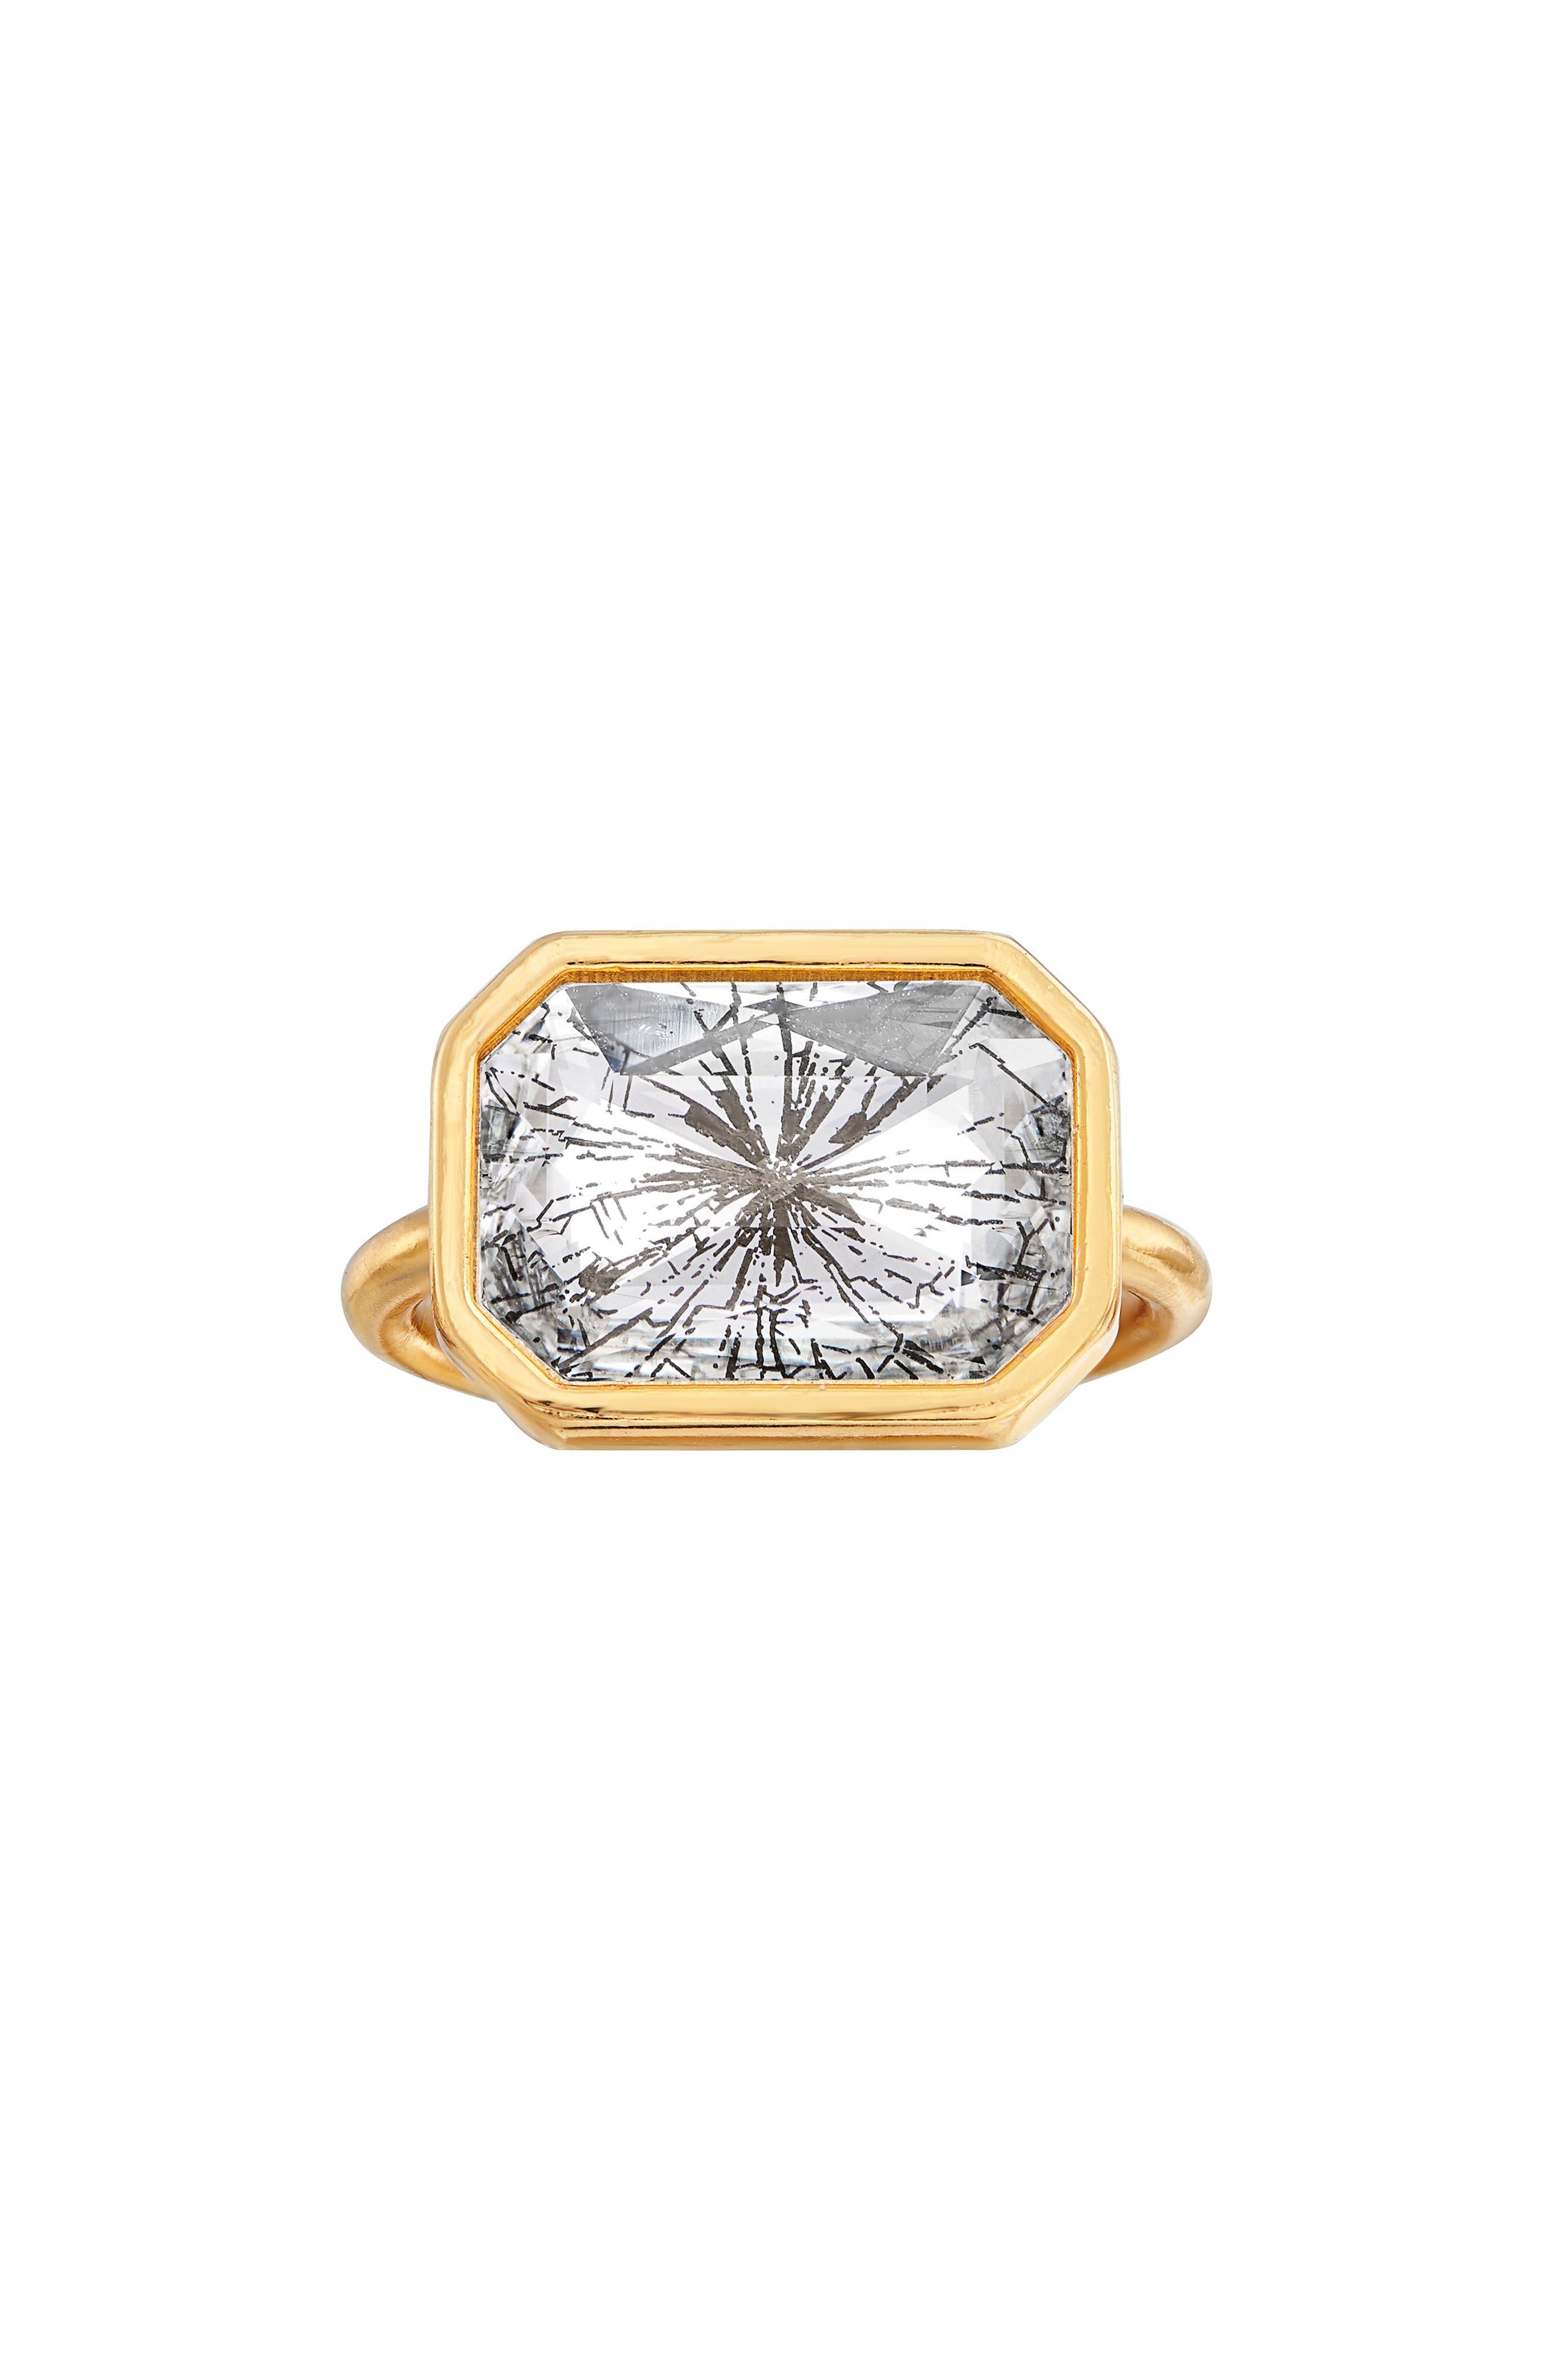 Luca + Danni Glass Ceiling Ring